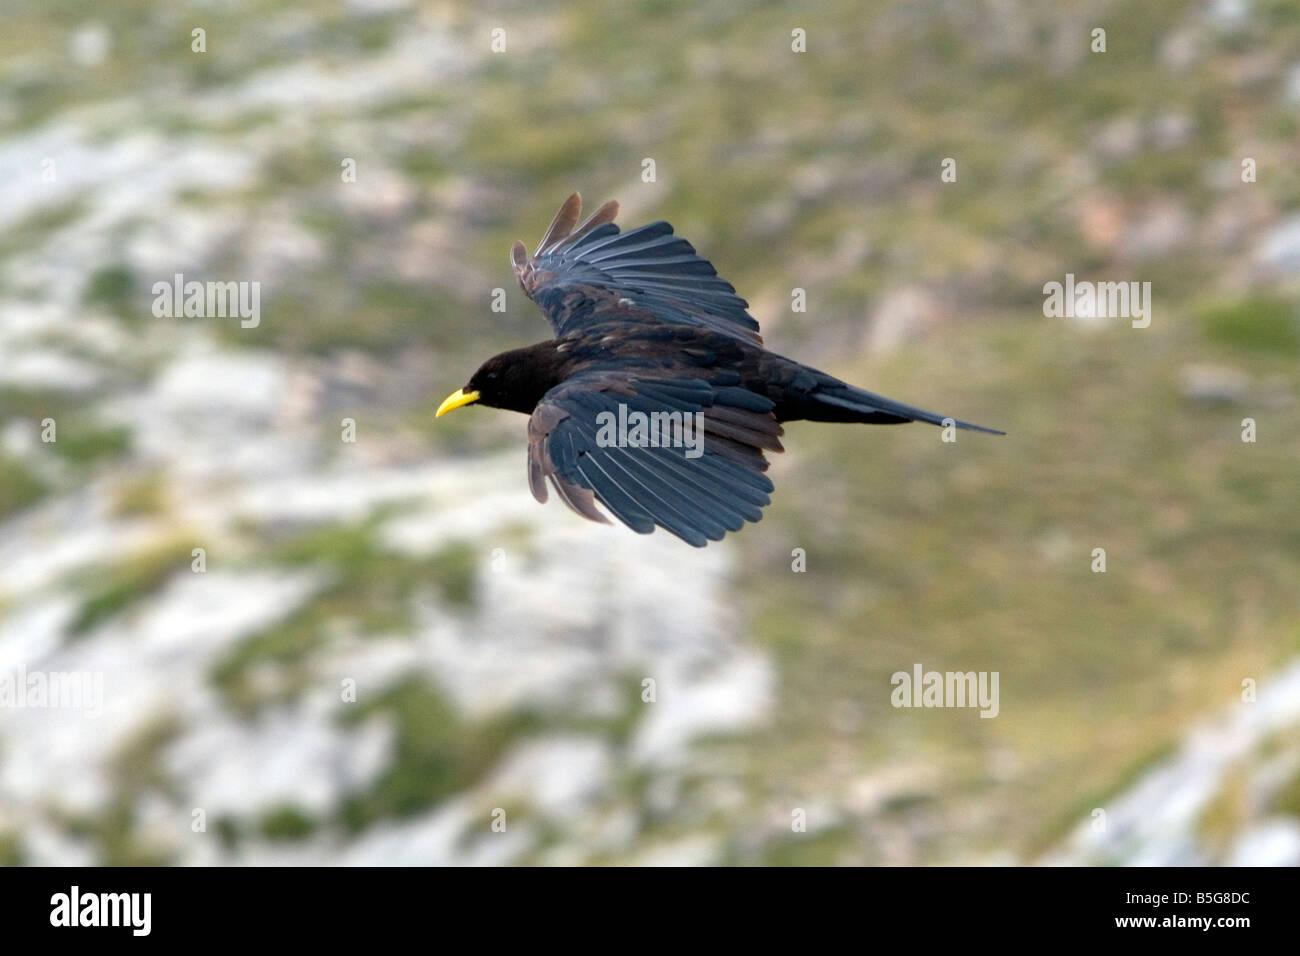 Alpine Chough flying in the Picos de Europa at Fuente De Liebana Cantabria northwestern Spain - Stock Image